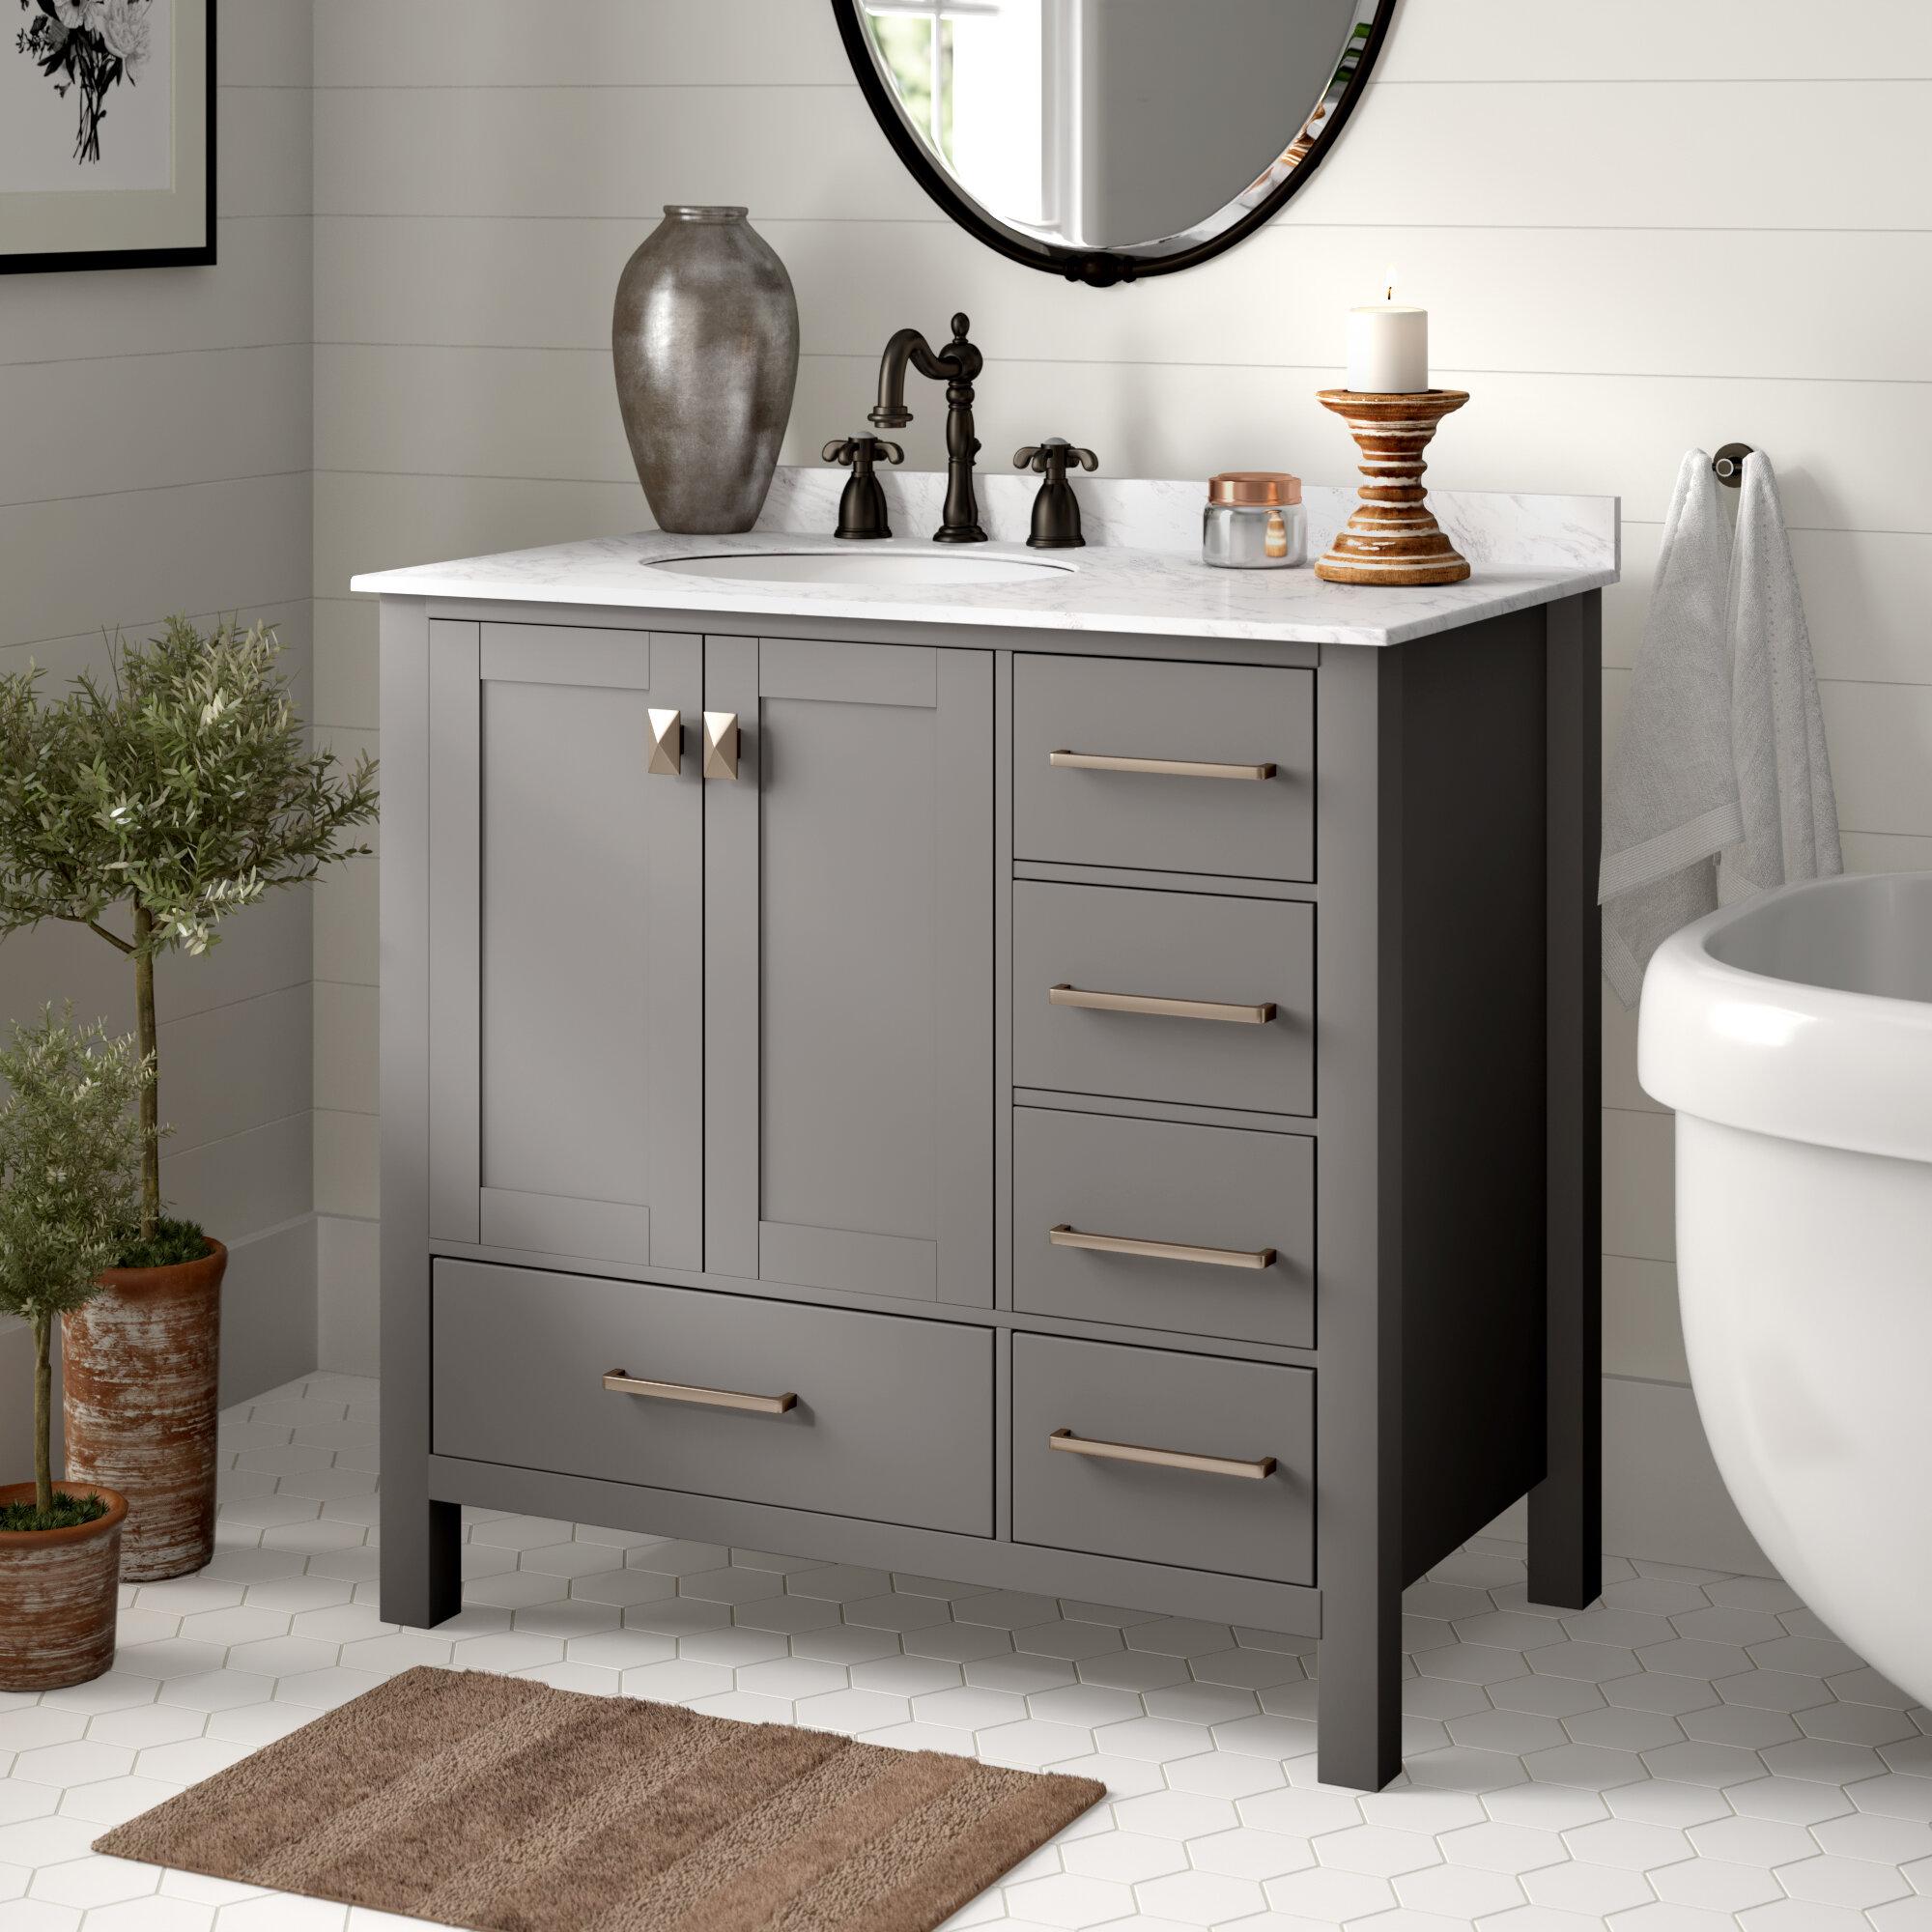 Sensational Newtown 36 Single Bathroom Vanity Set Download Free Architecture Designs Rallybritishbridgeorg